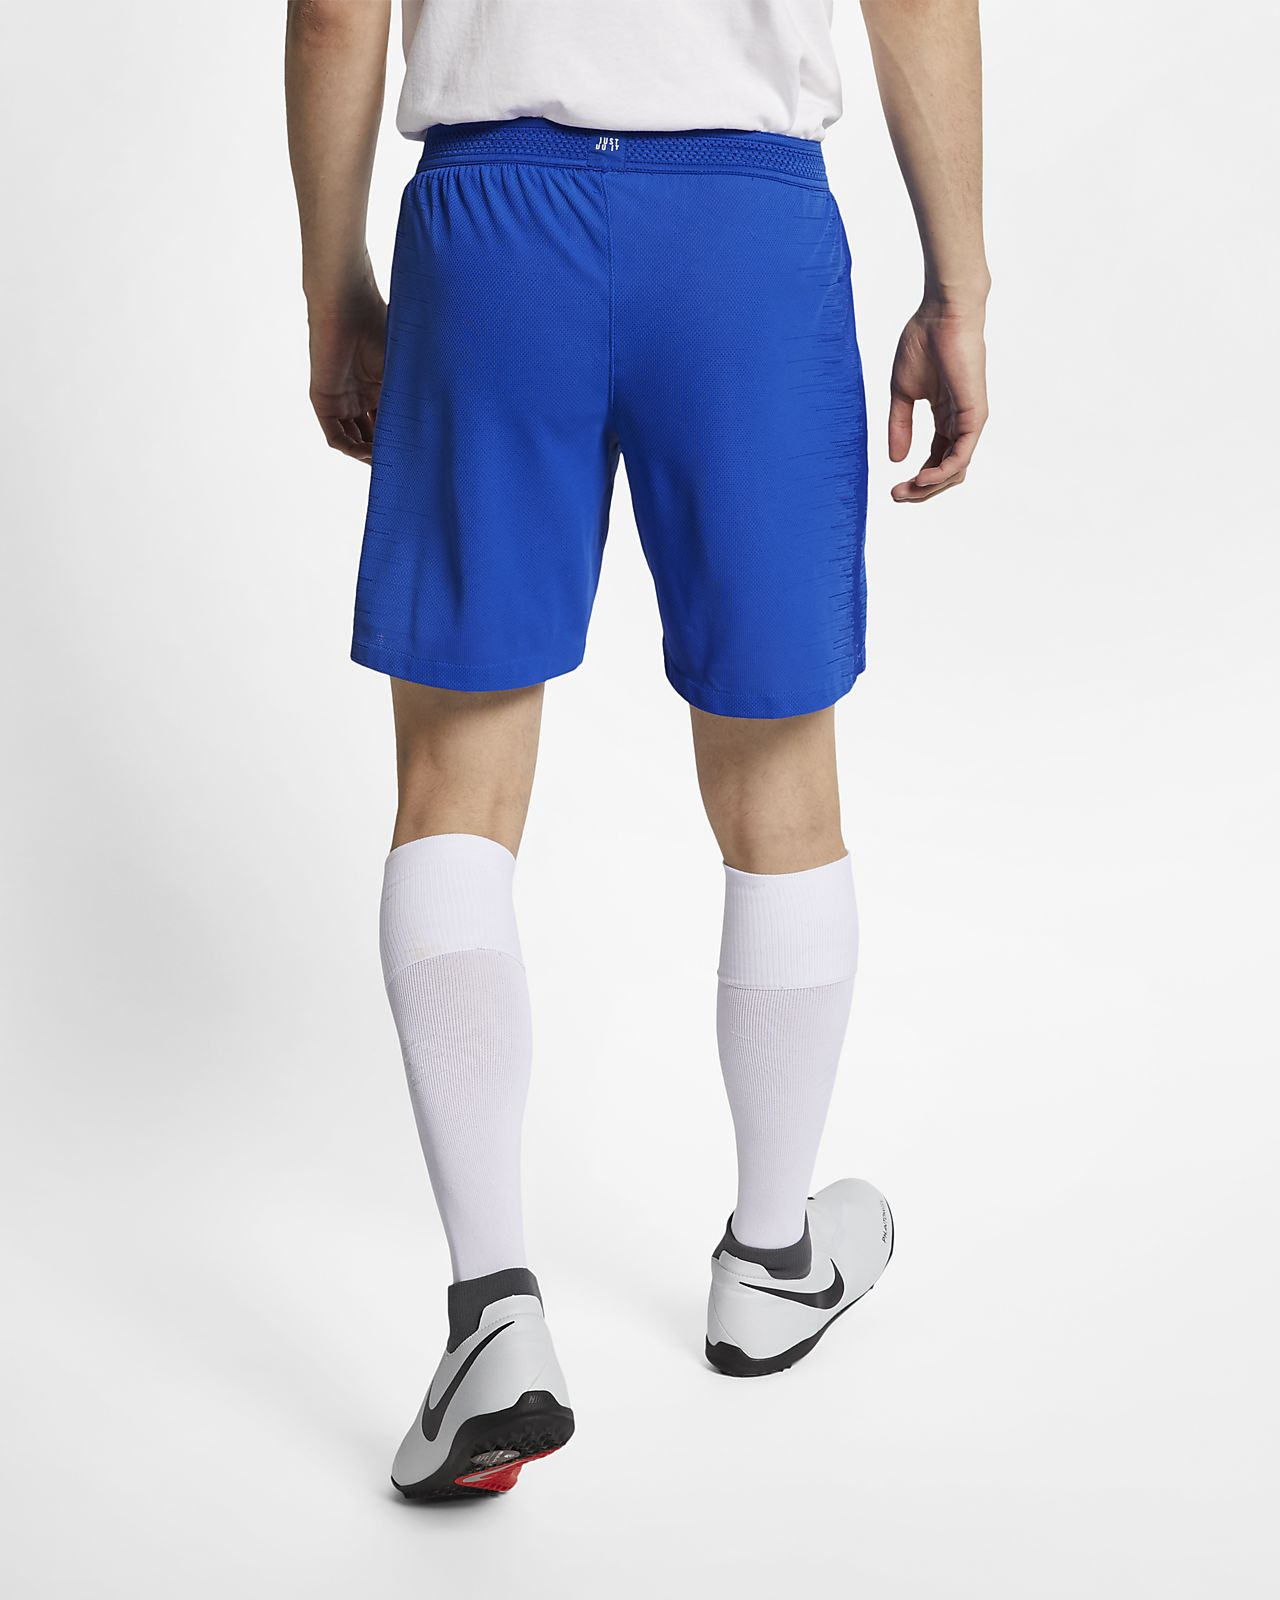 87bf5e9beee598 Męskie spodenki piłkarskie Nike VaporKnit Strike. Nike.com PL